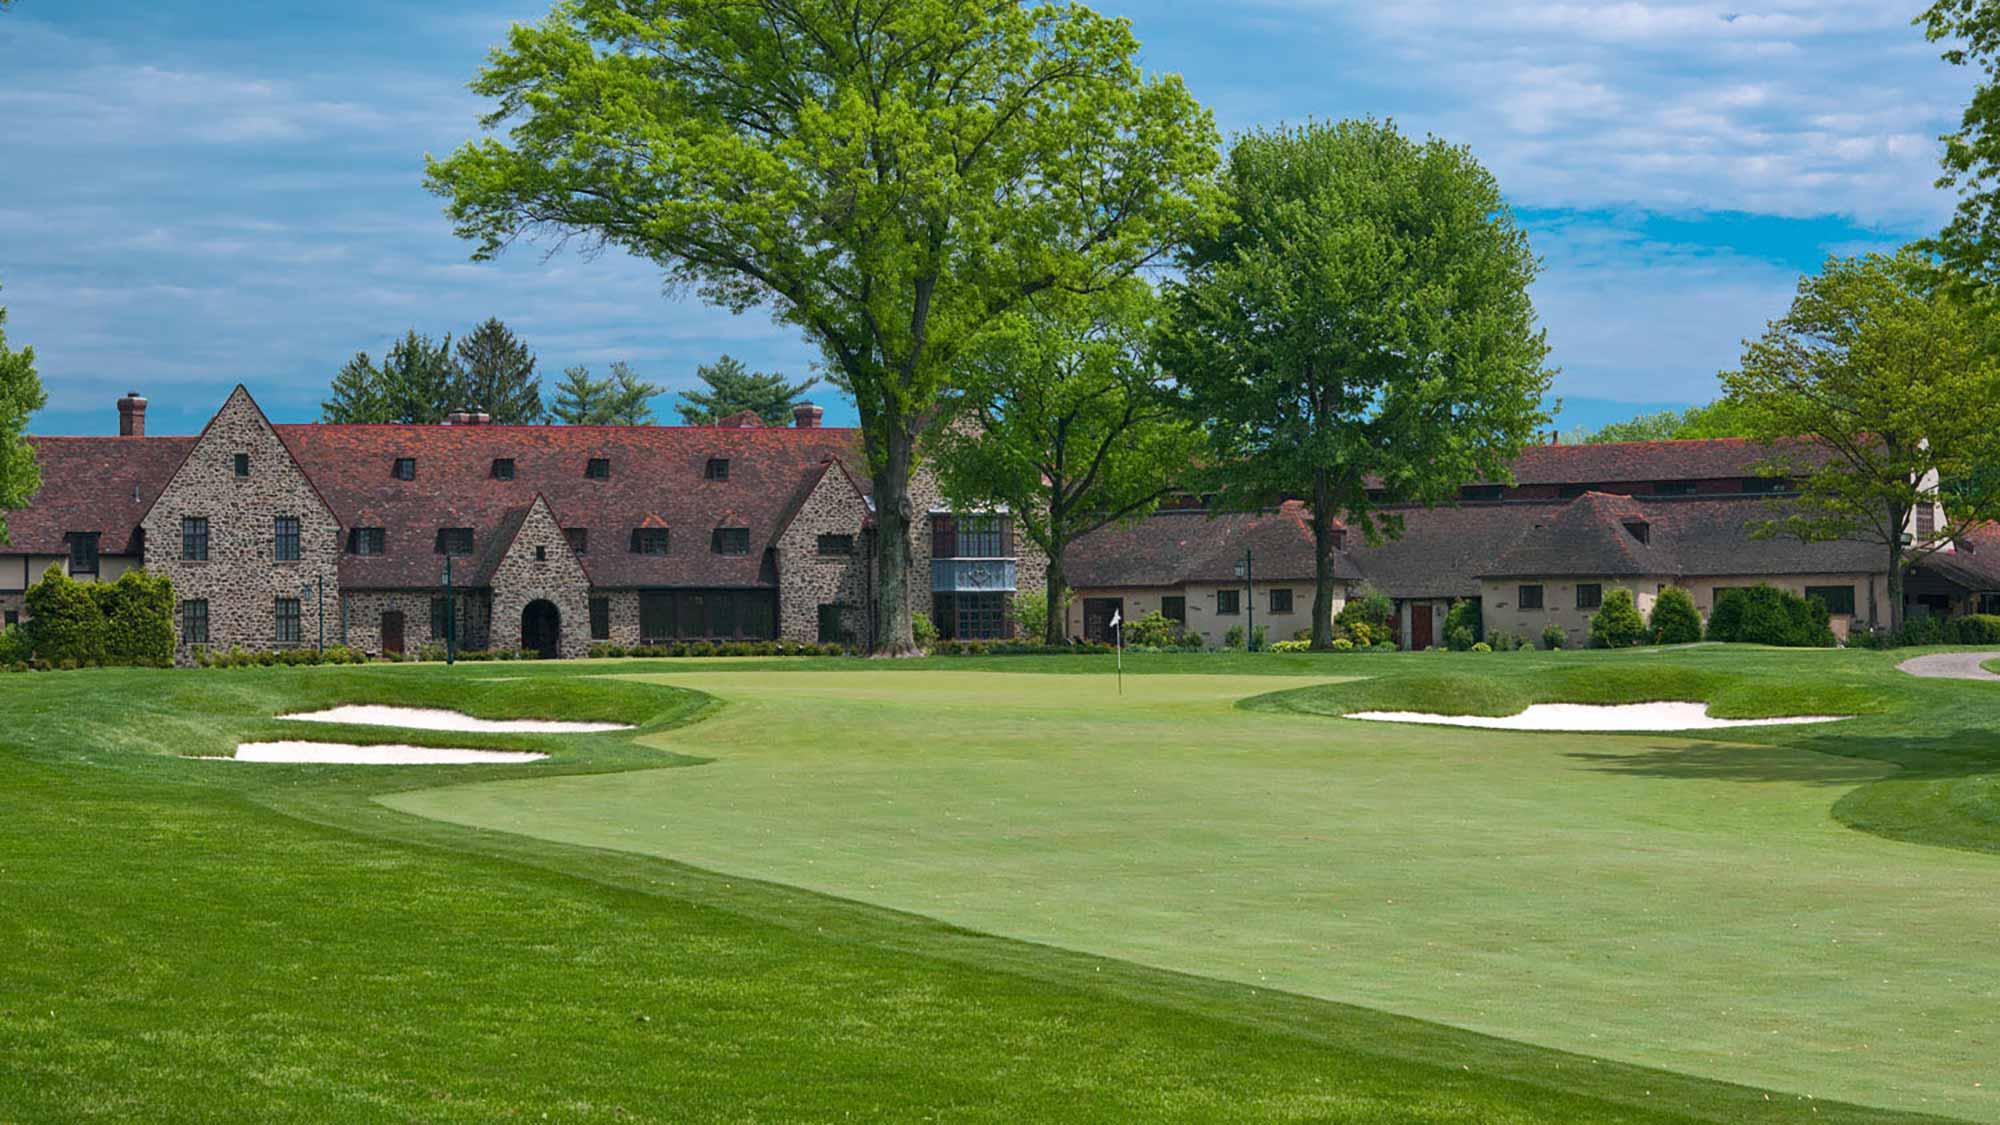 pga of america to conduct kpmg women u2019s pga championship at aronimink golf club